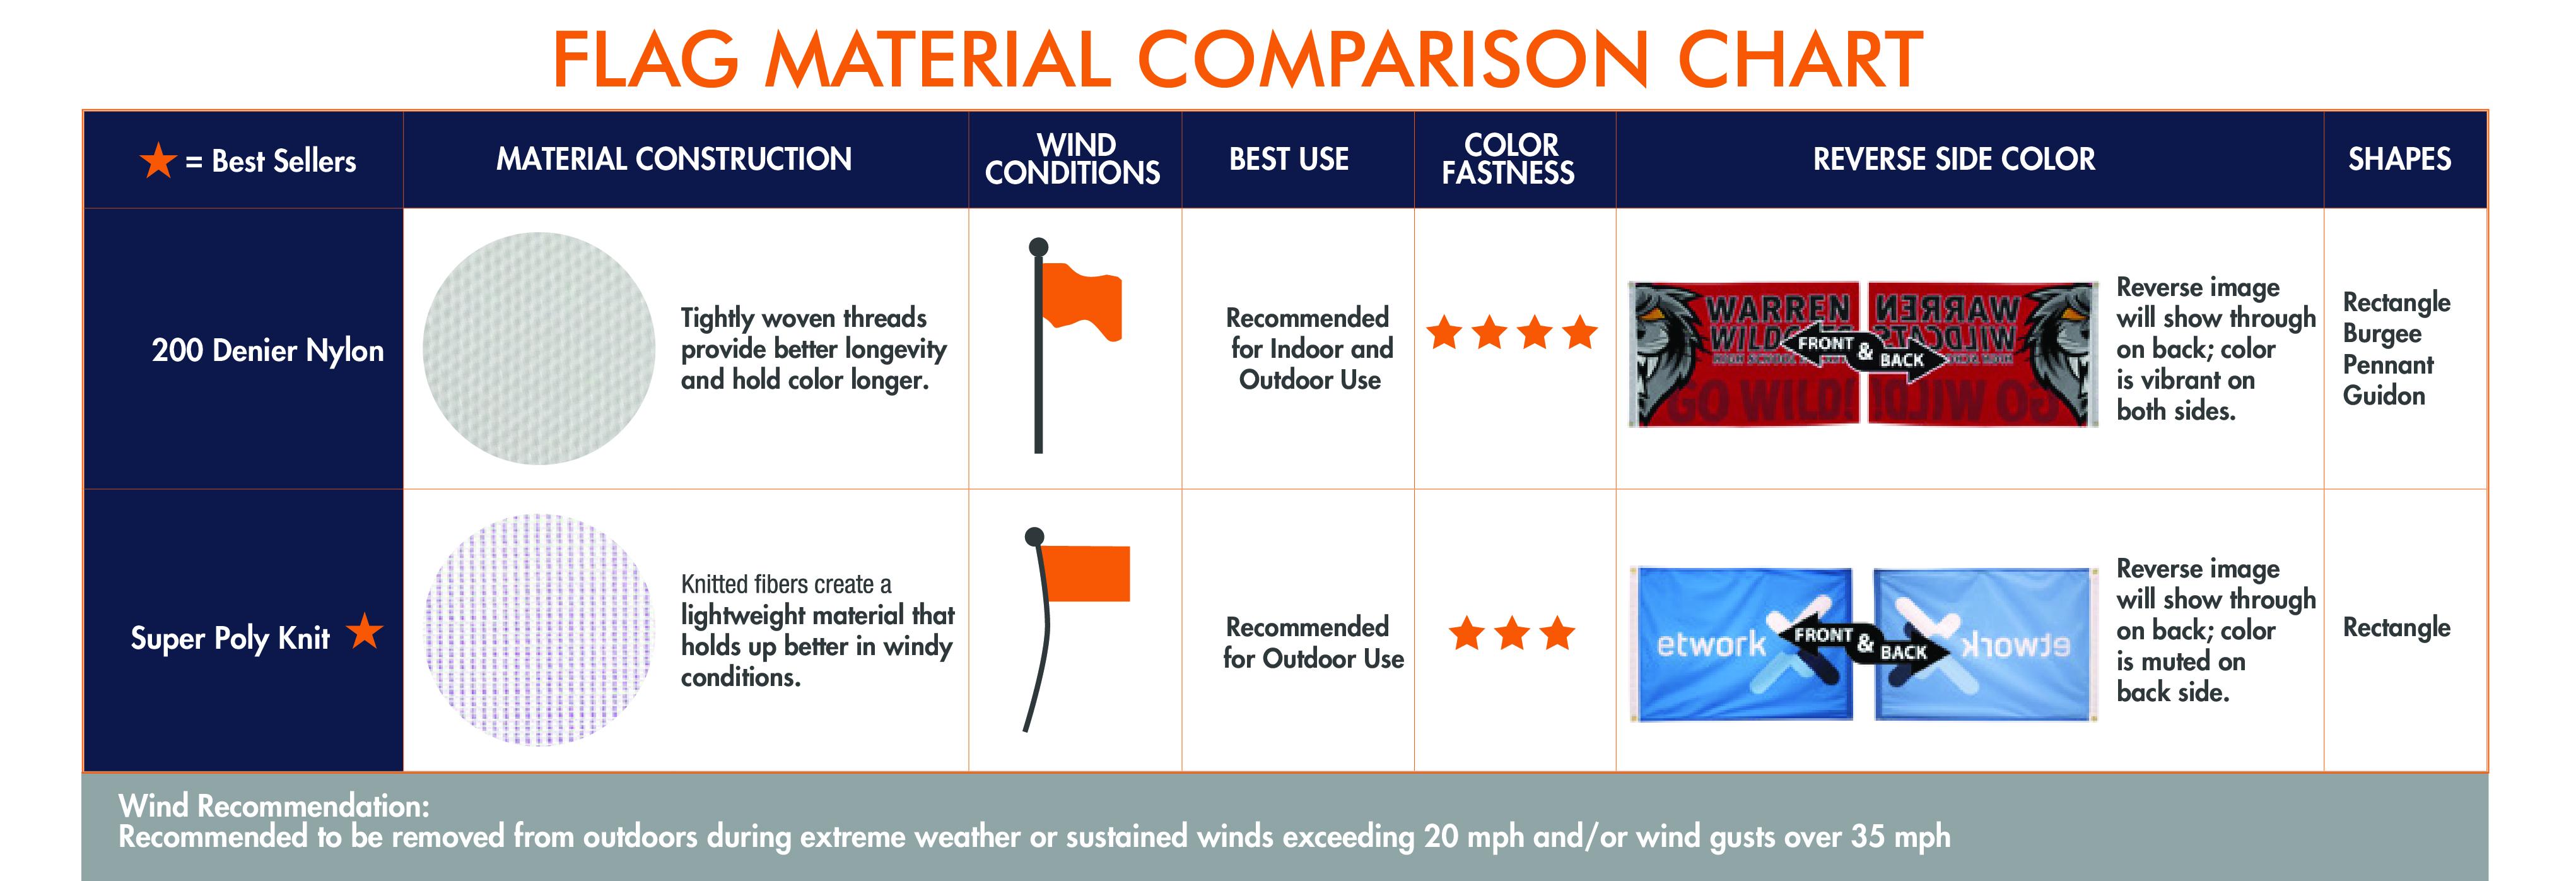 Flag Material Comparison Chart